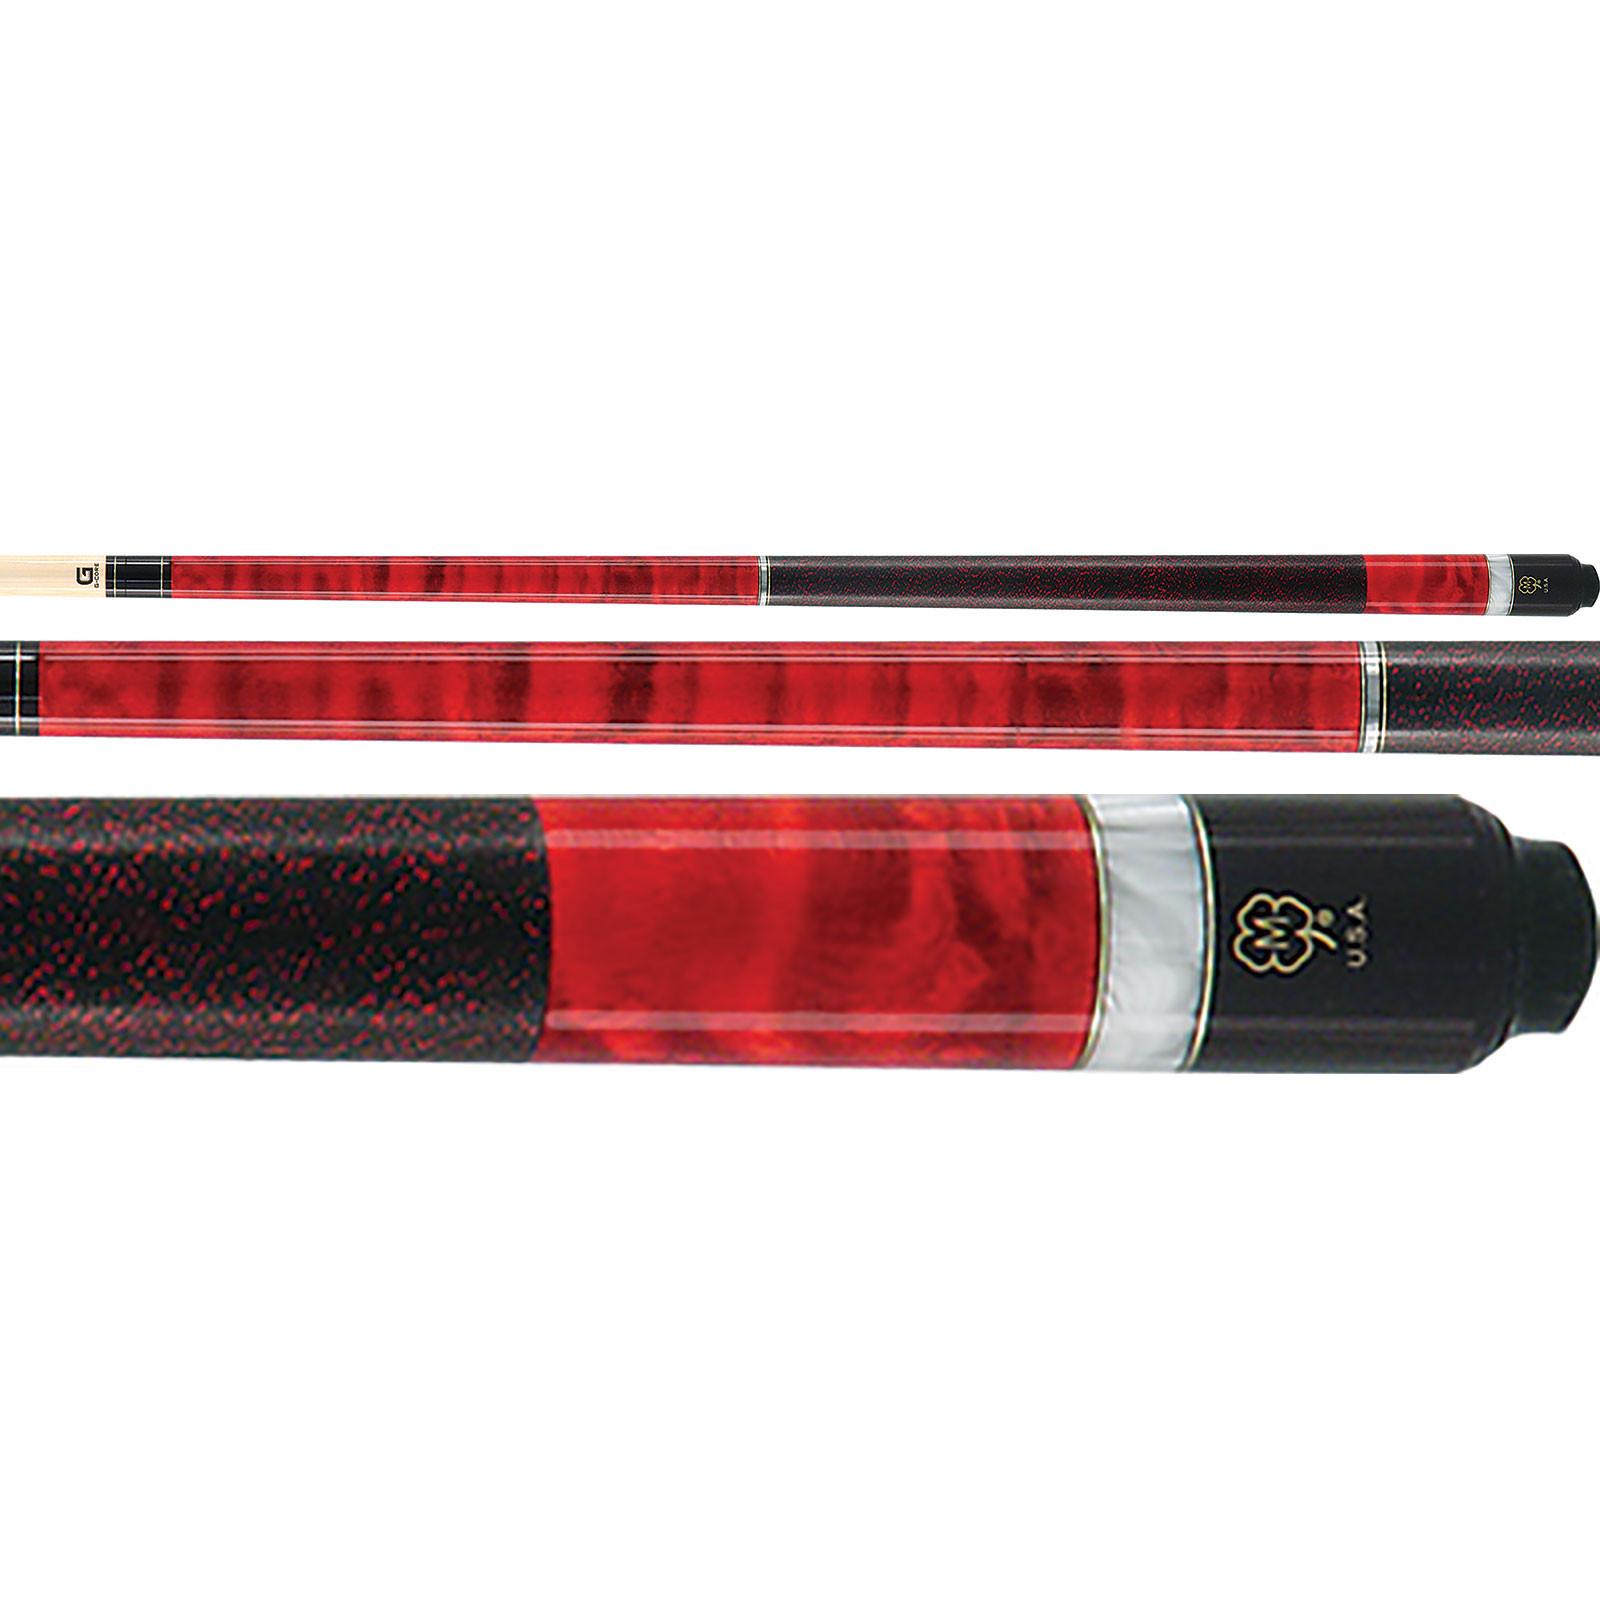 Mcdermott G208 G Series Red Pool Cue